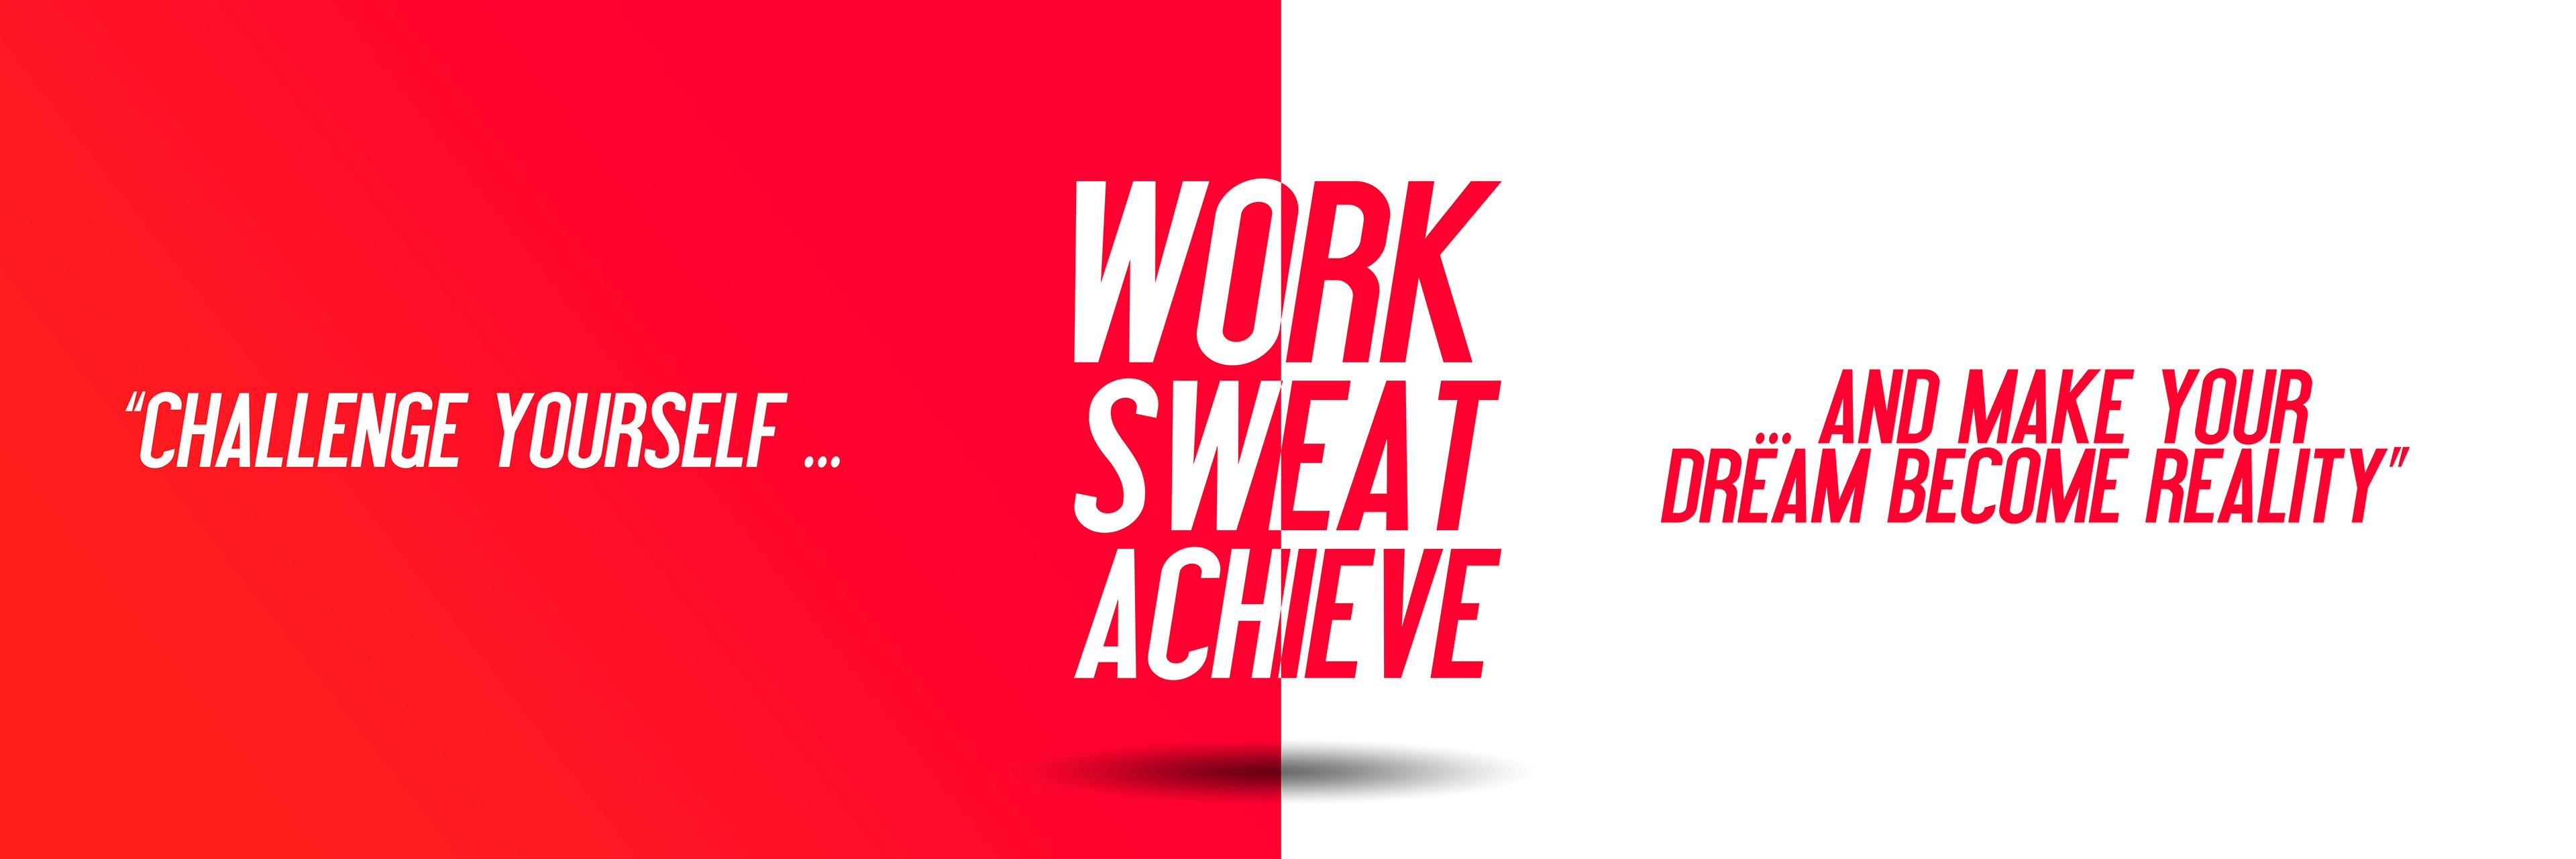 Dream, Reality, Work, Sweat, Achieve, Challenge, Popular quotes, Typography